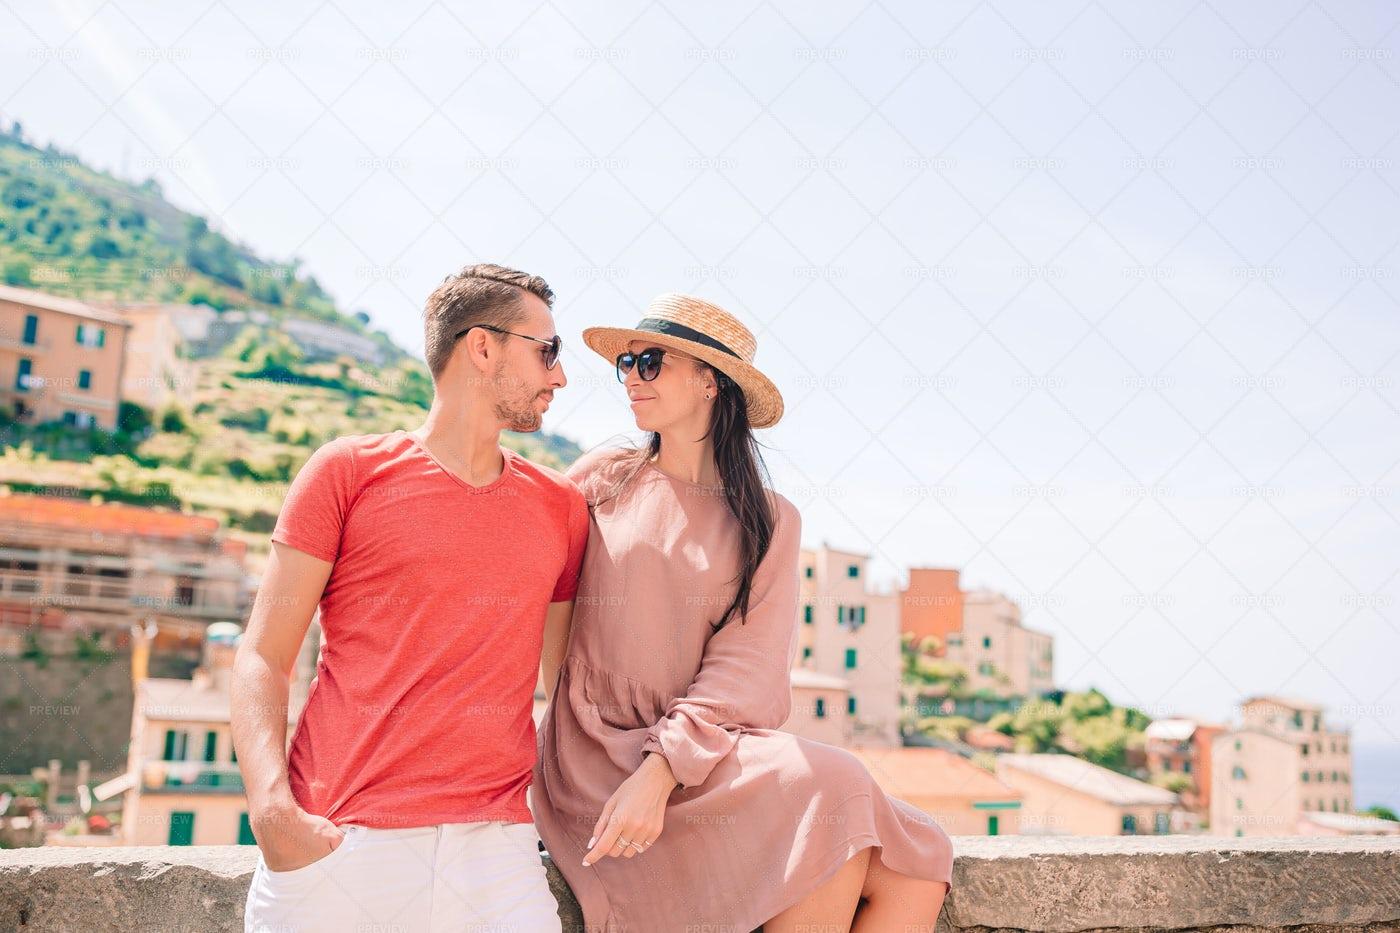 Tourists Couple At Riomaggiore: Stock Photos